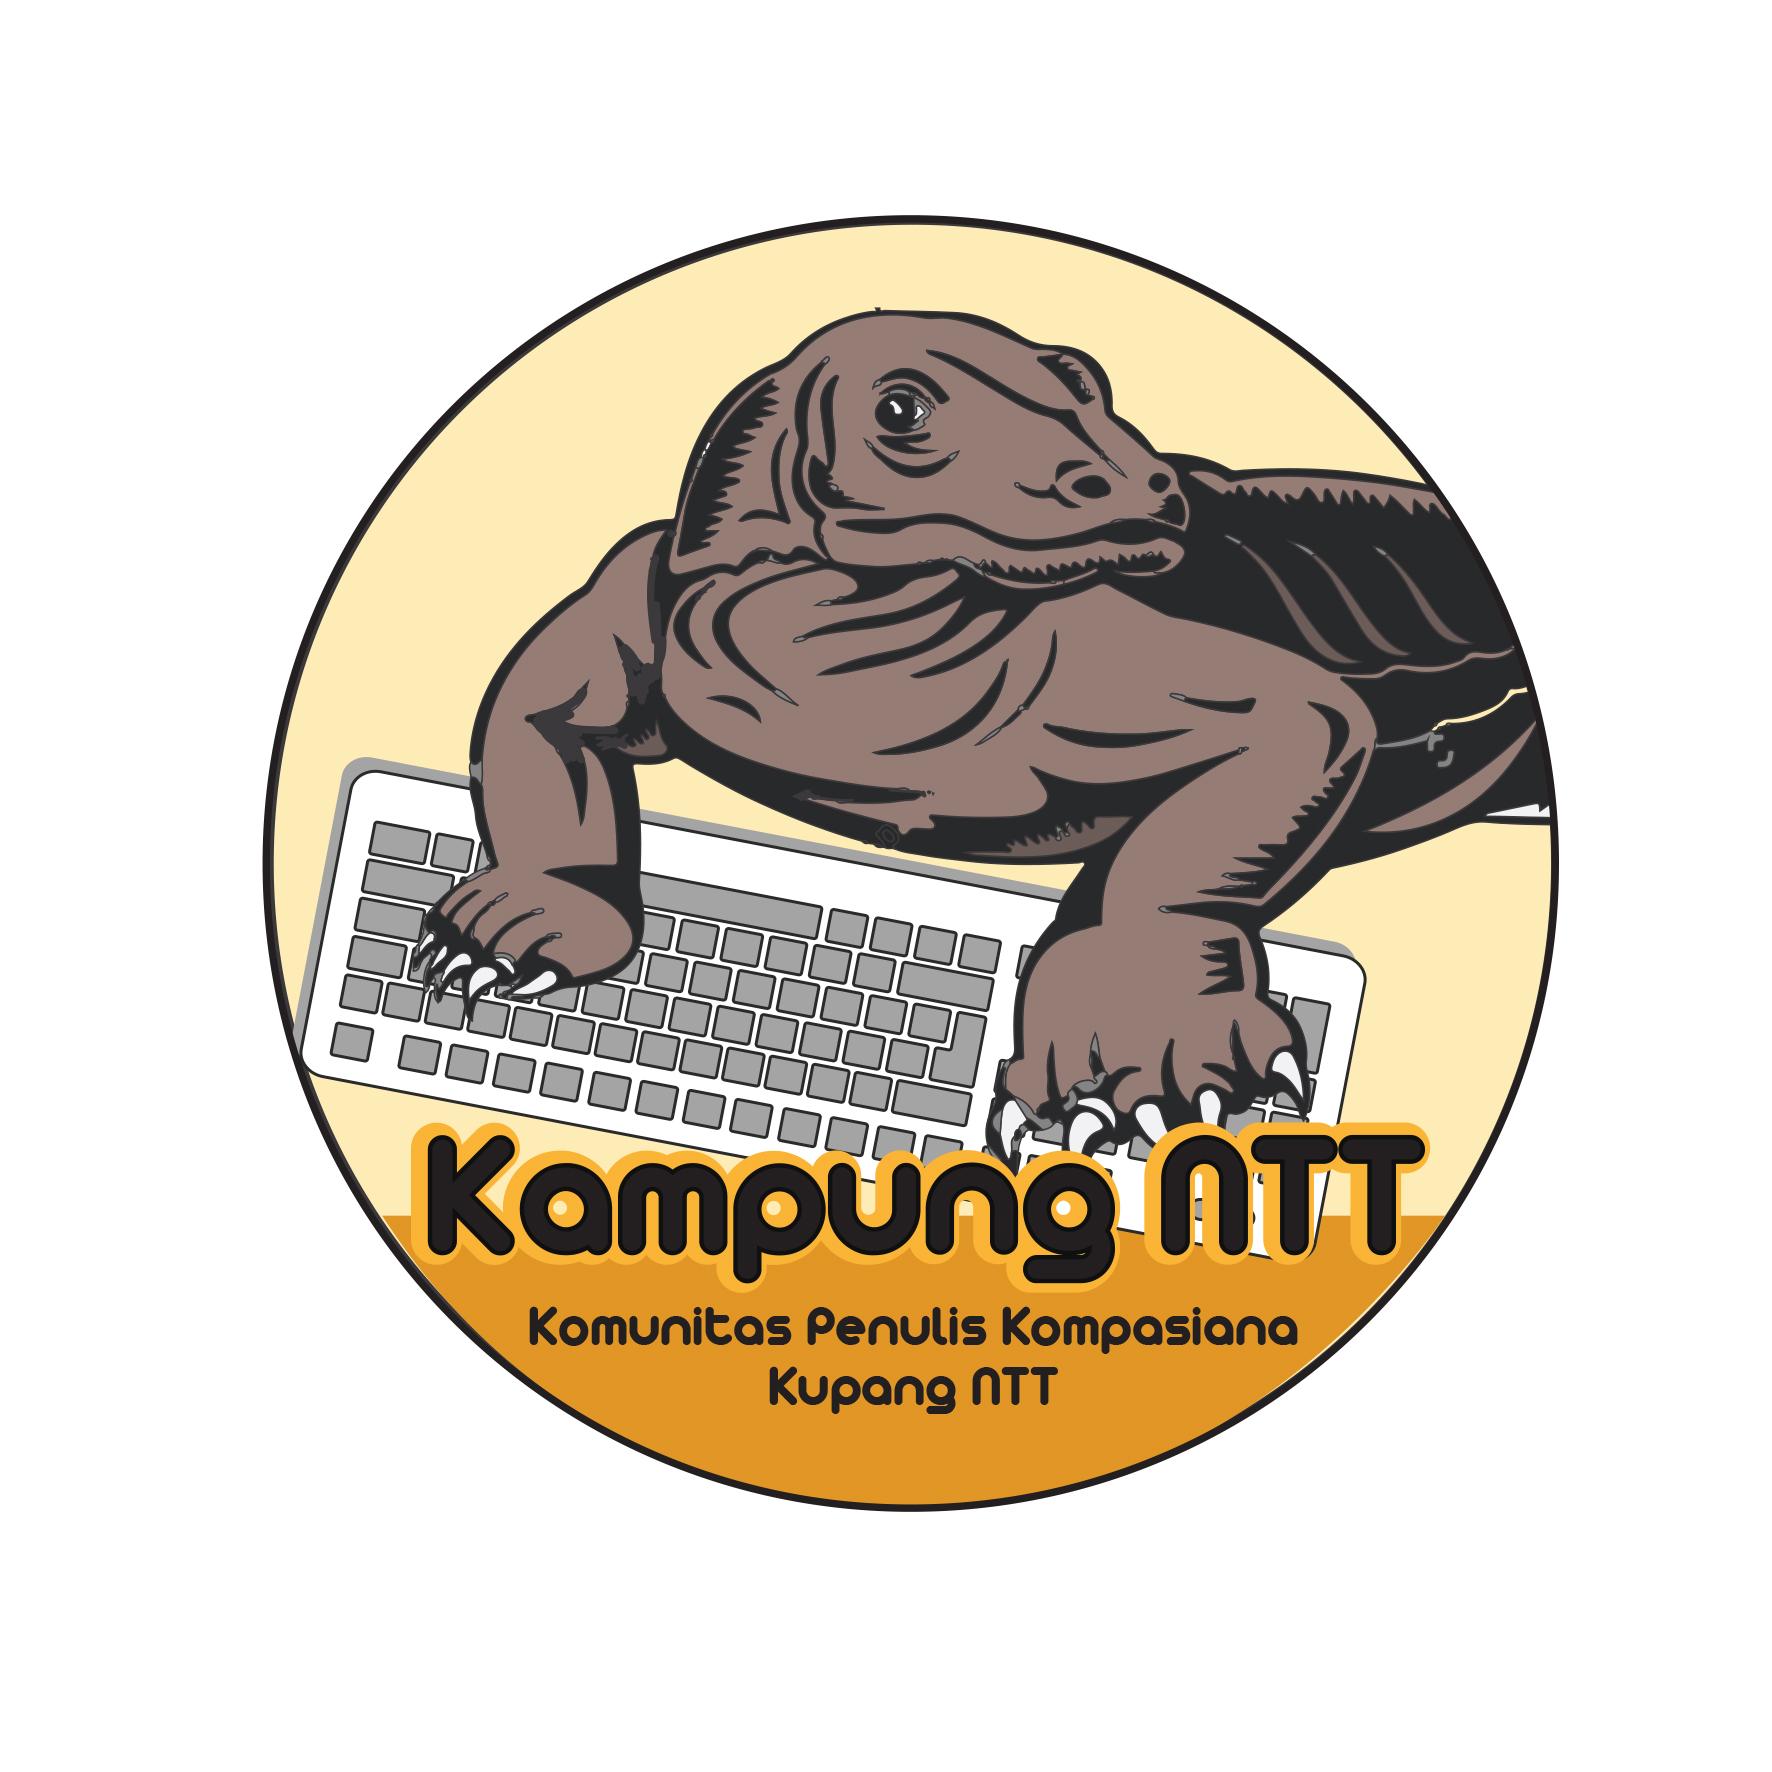 items/kaleidoskop_2020/kampung-ntt-1607602484.jpg